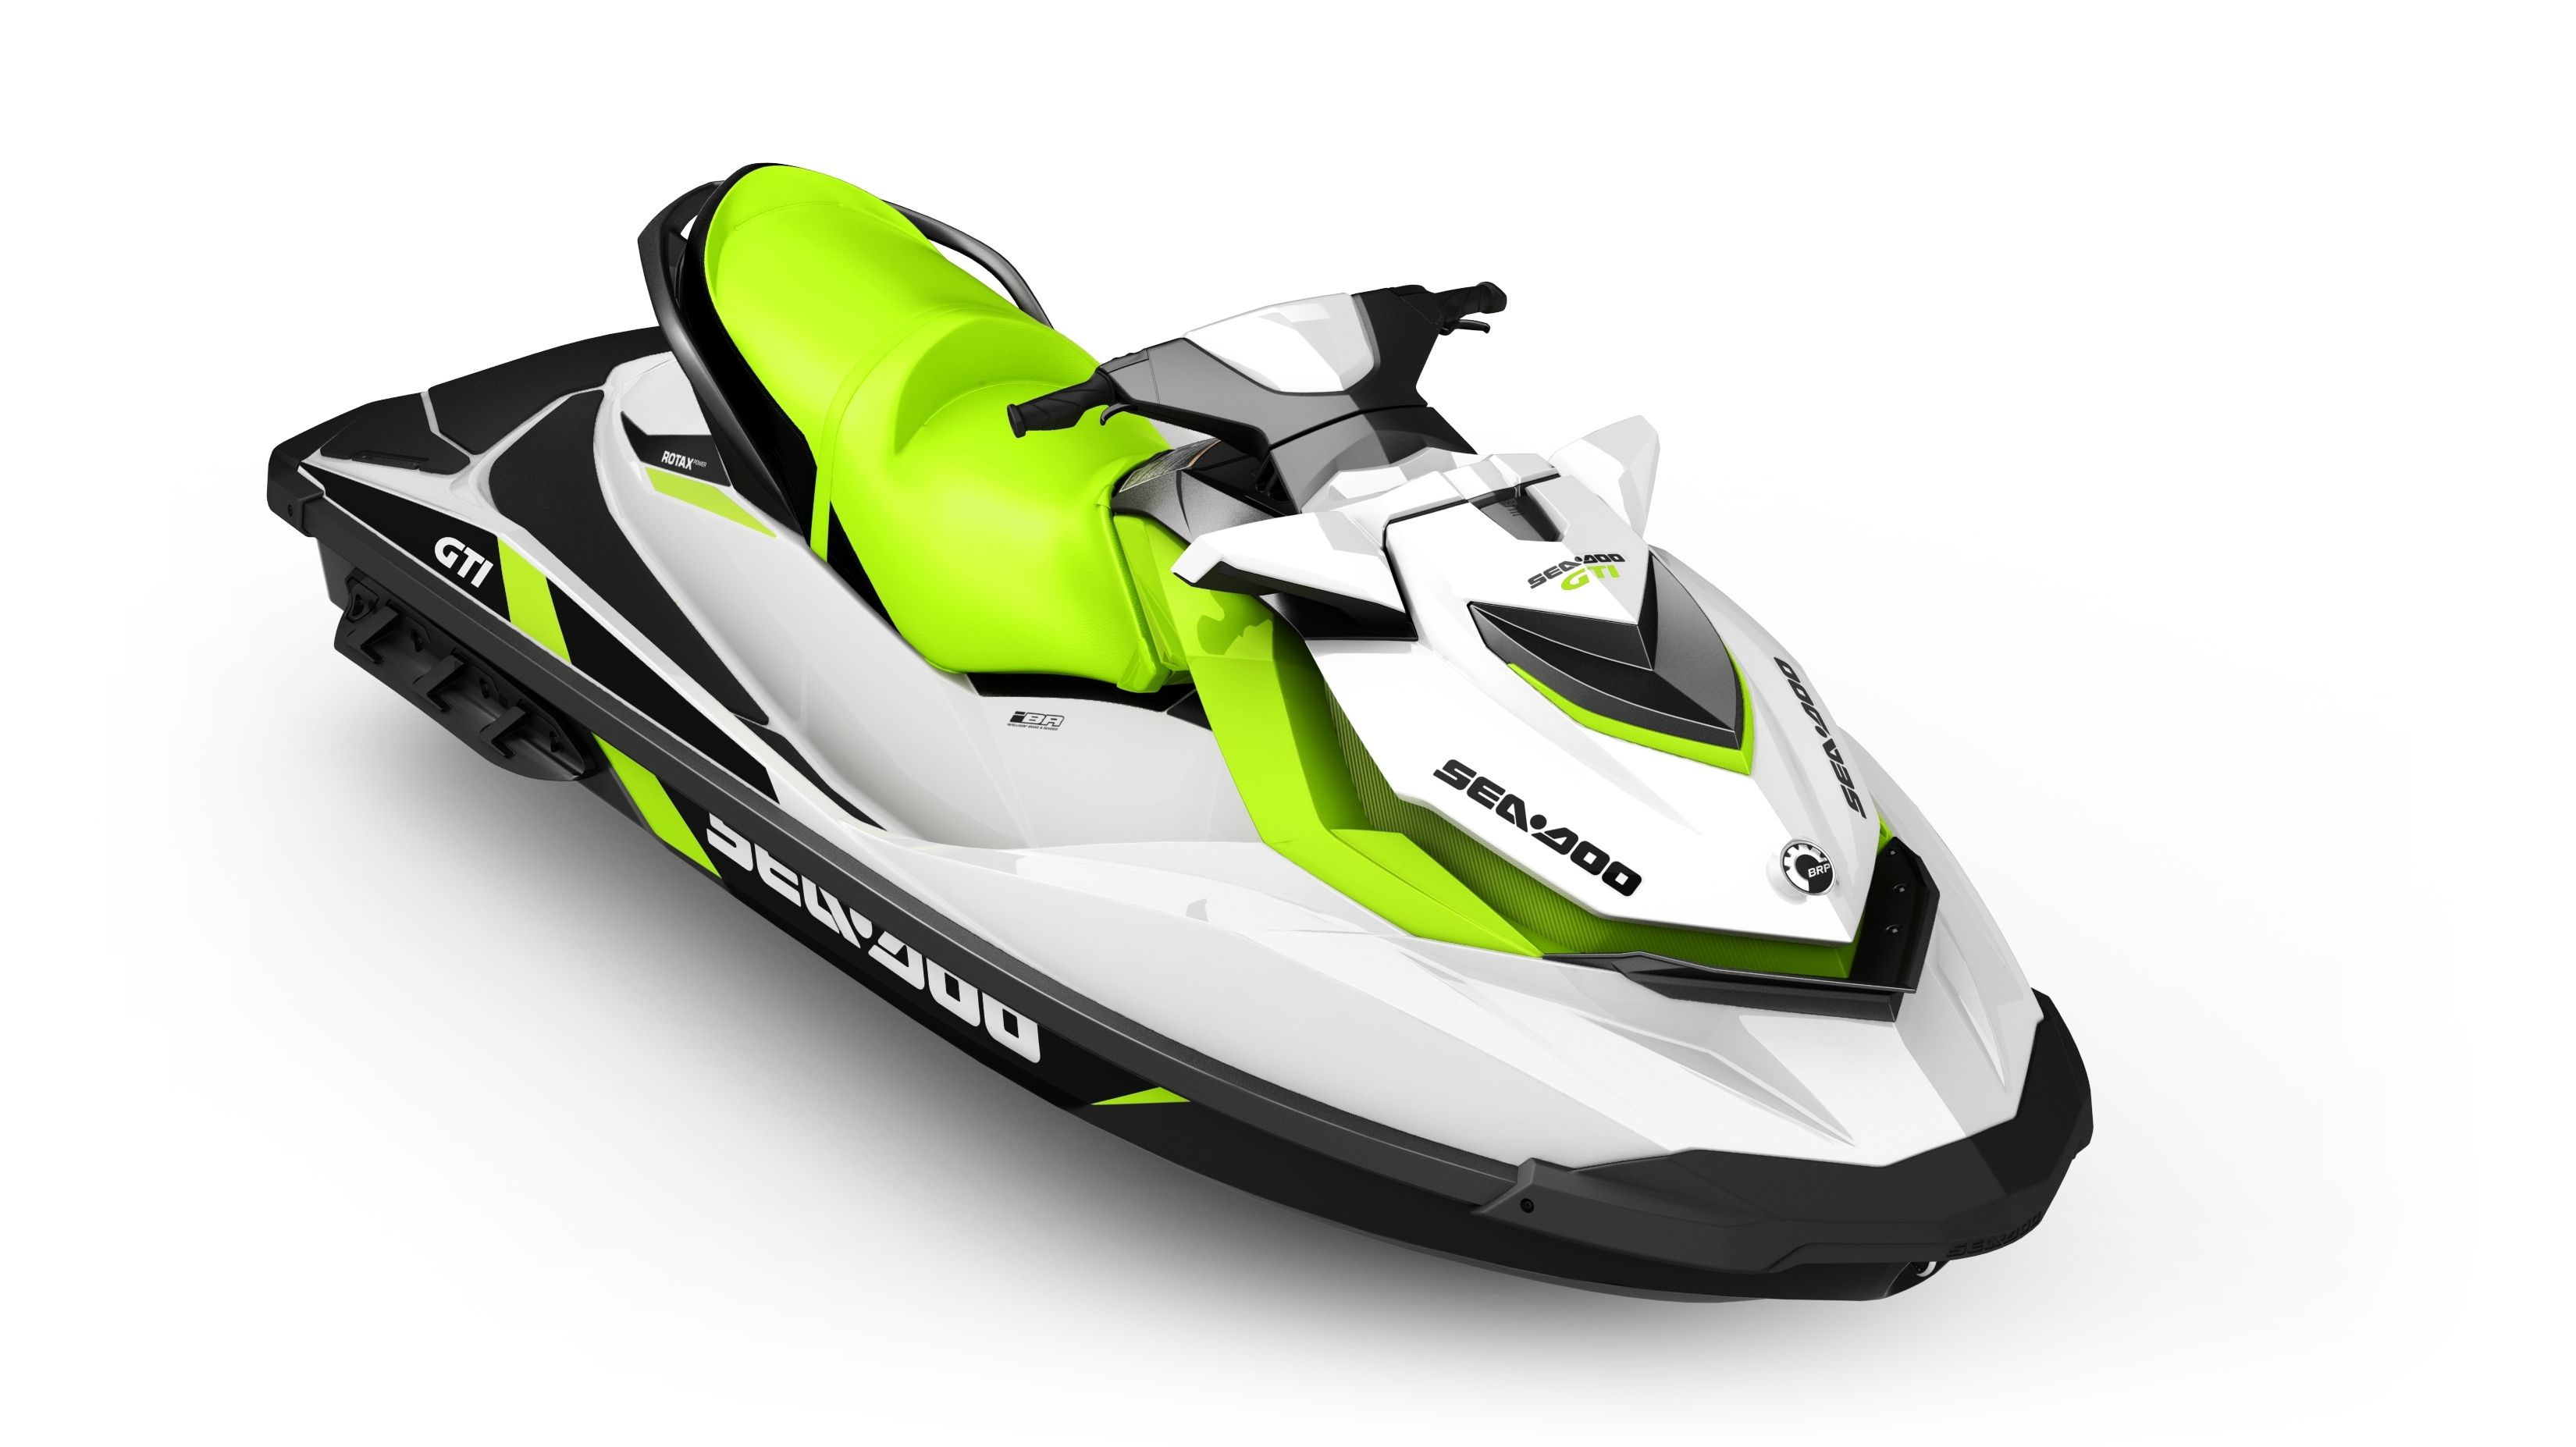 2017 SeaDoo GTI Skis for sale, Jet ski, Sport boats